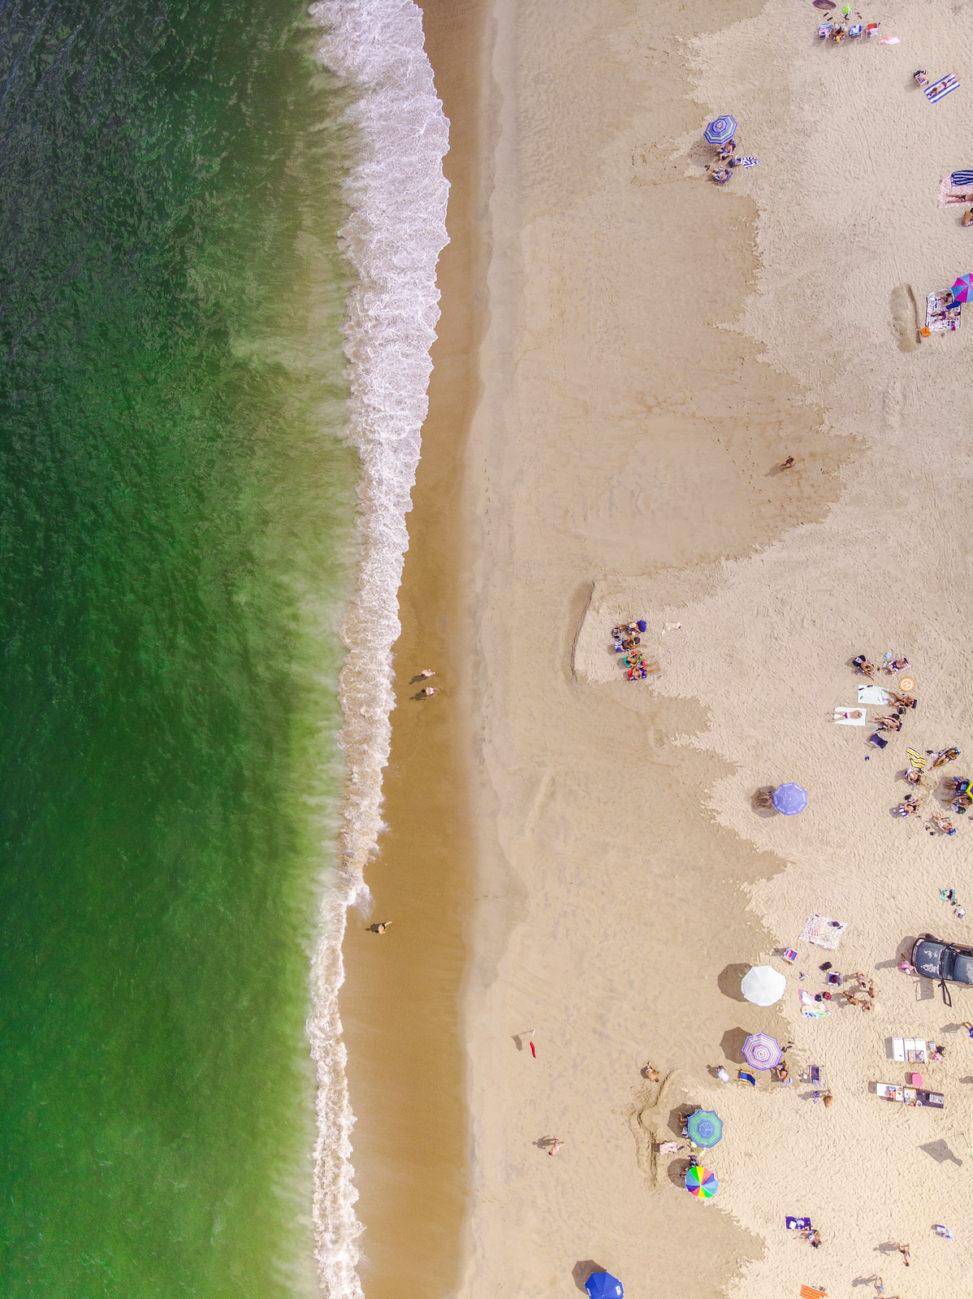 2019.08.10 Rehoboth Beach by Drone, Rehoboth Beach DE, USA 221 22222